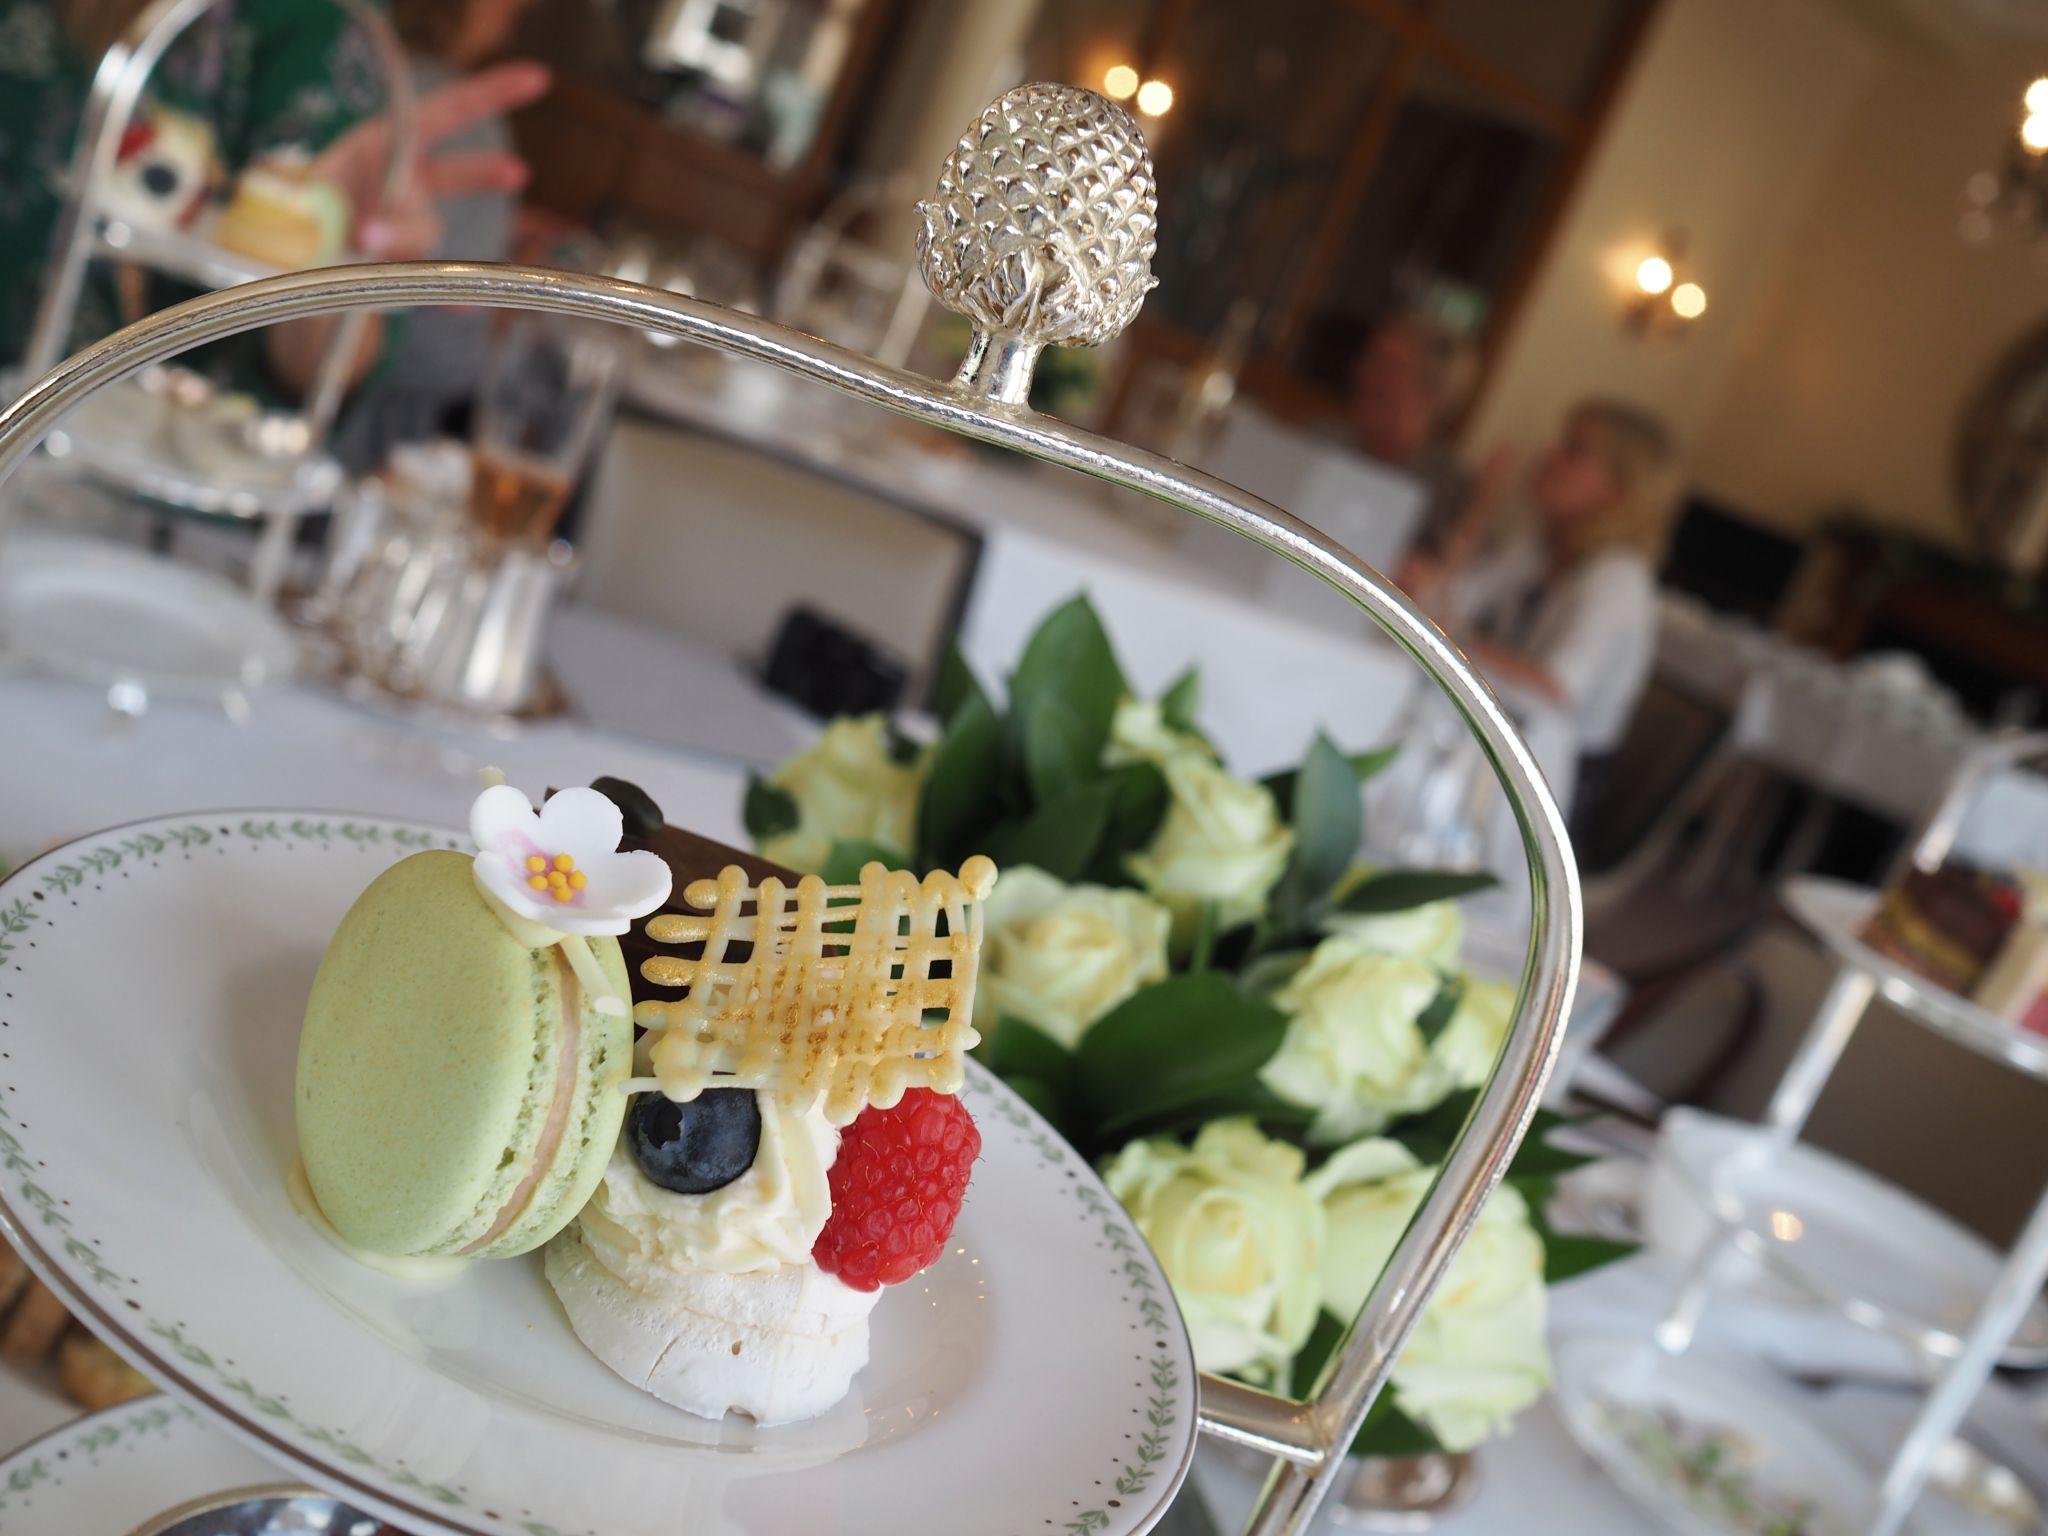 Bettys afternoon tea cakes